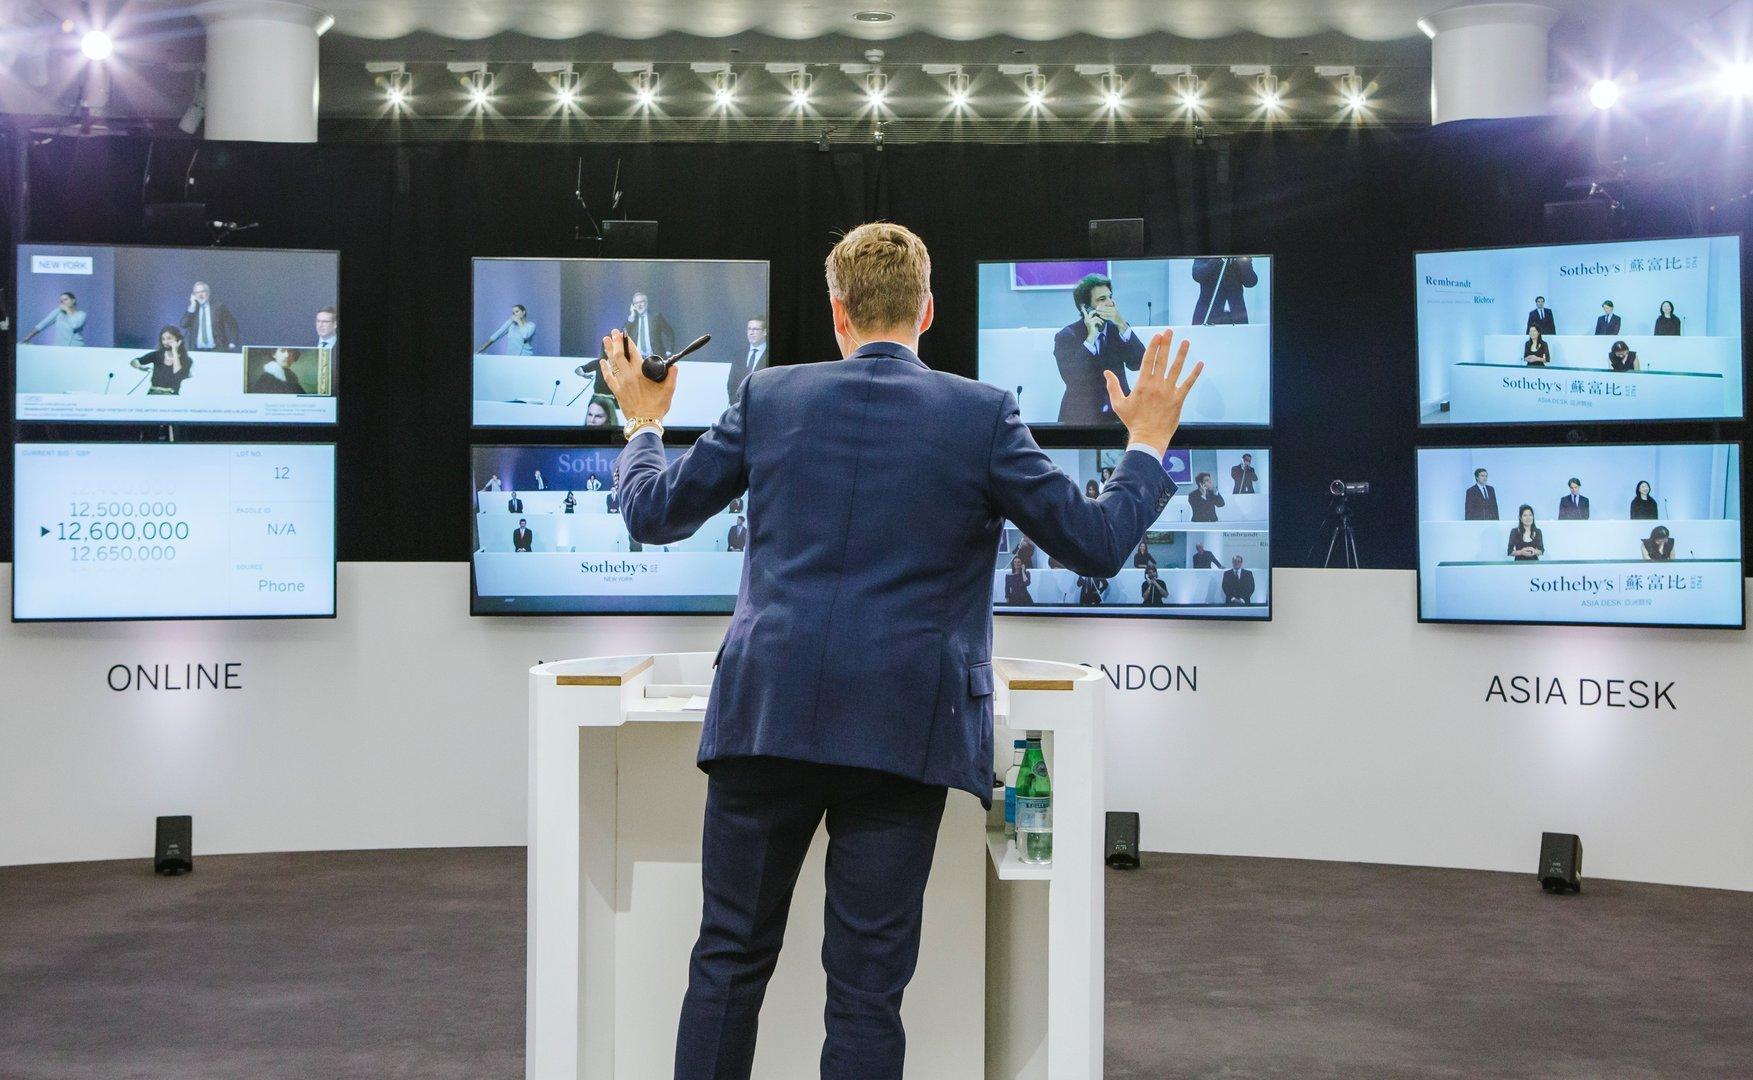 Kunstmarkt: Sotheby's meldet 2,5 Milliarden US-$ Umsatz